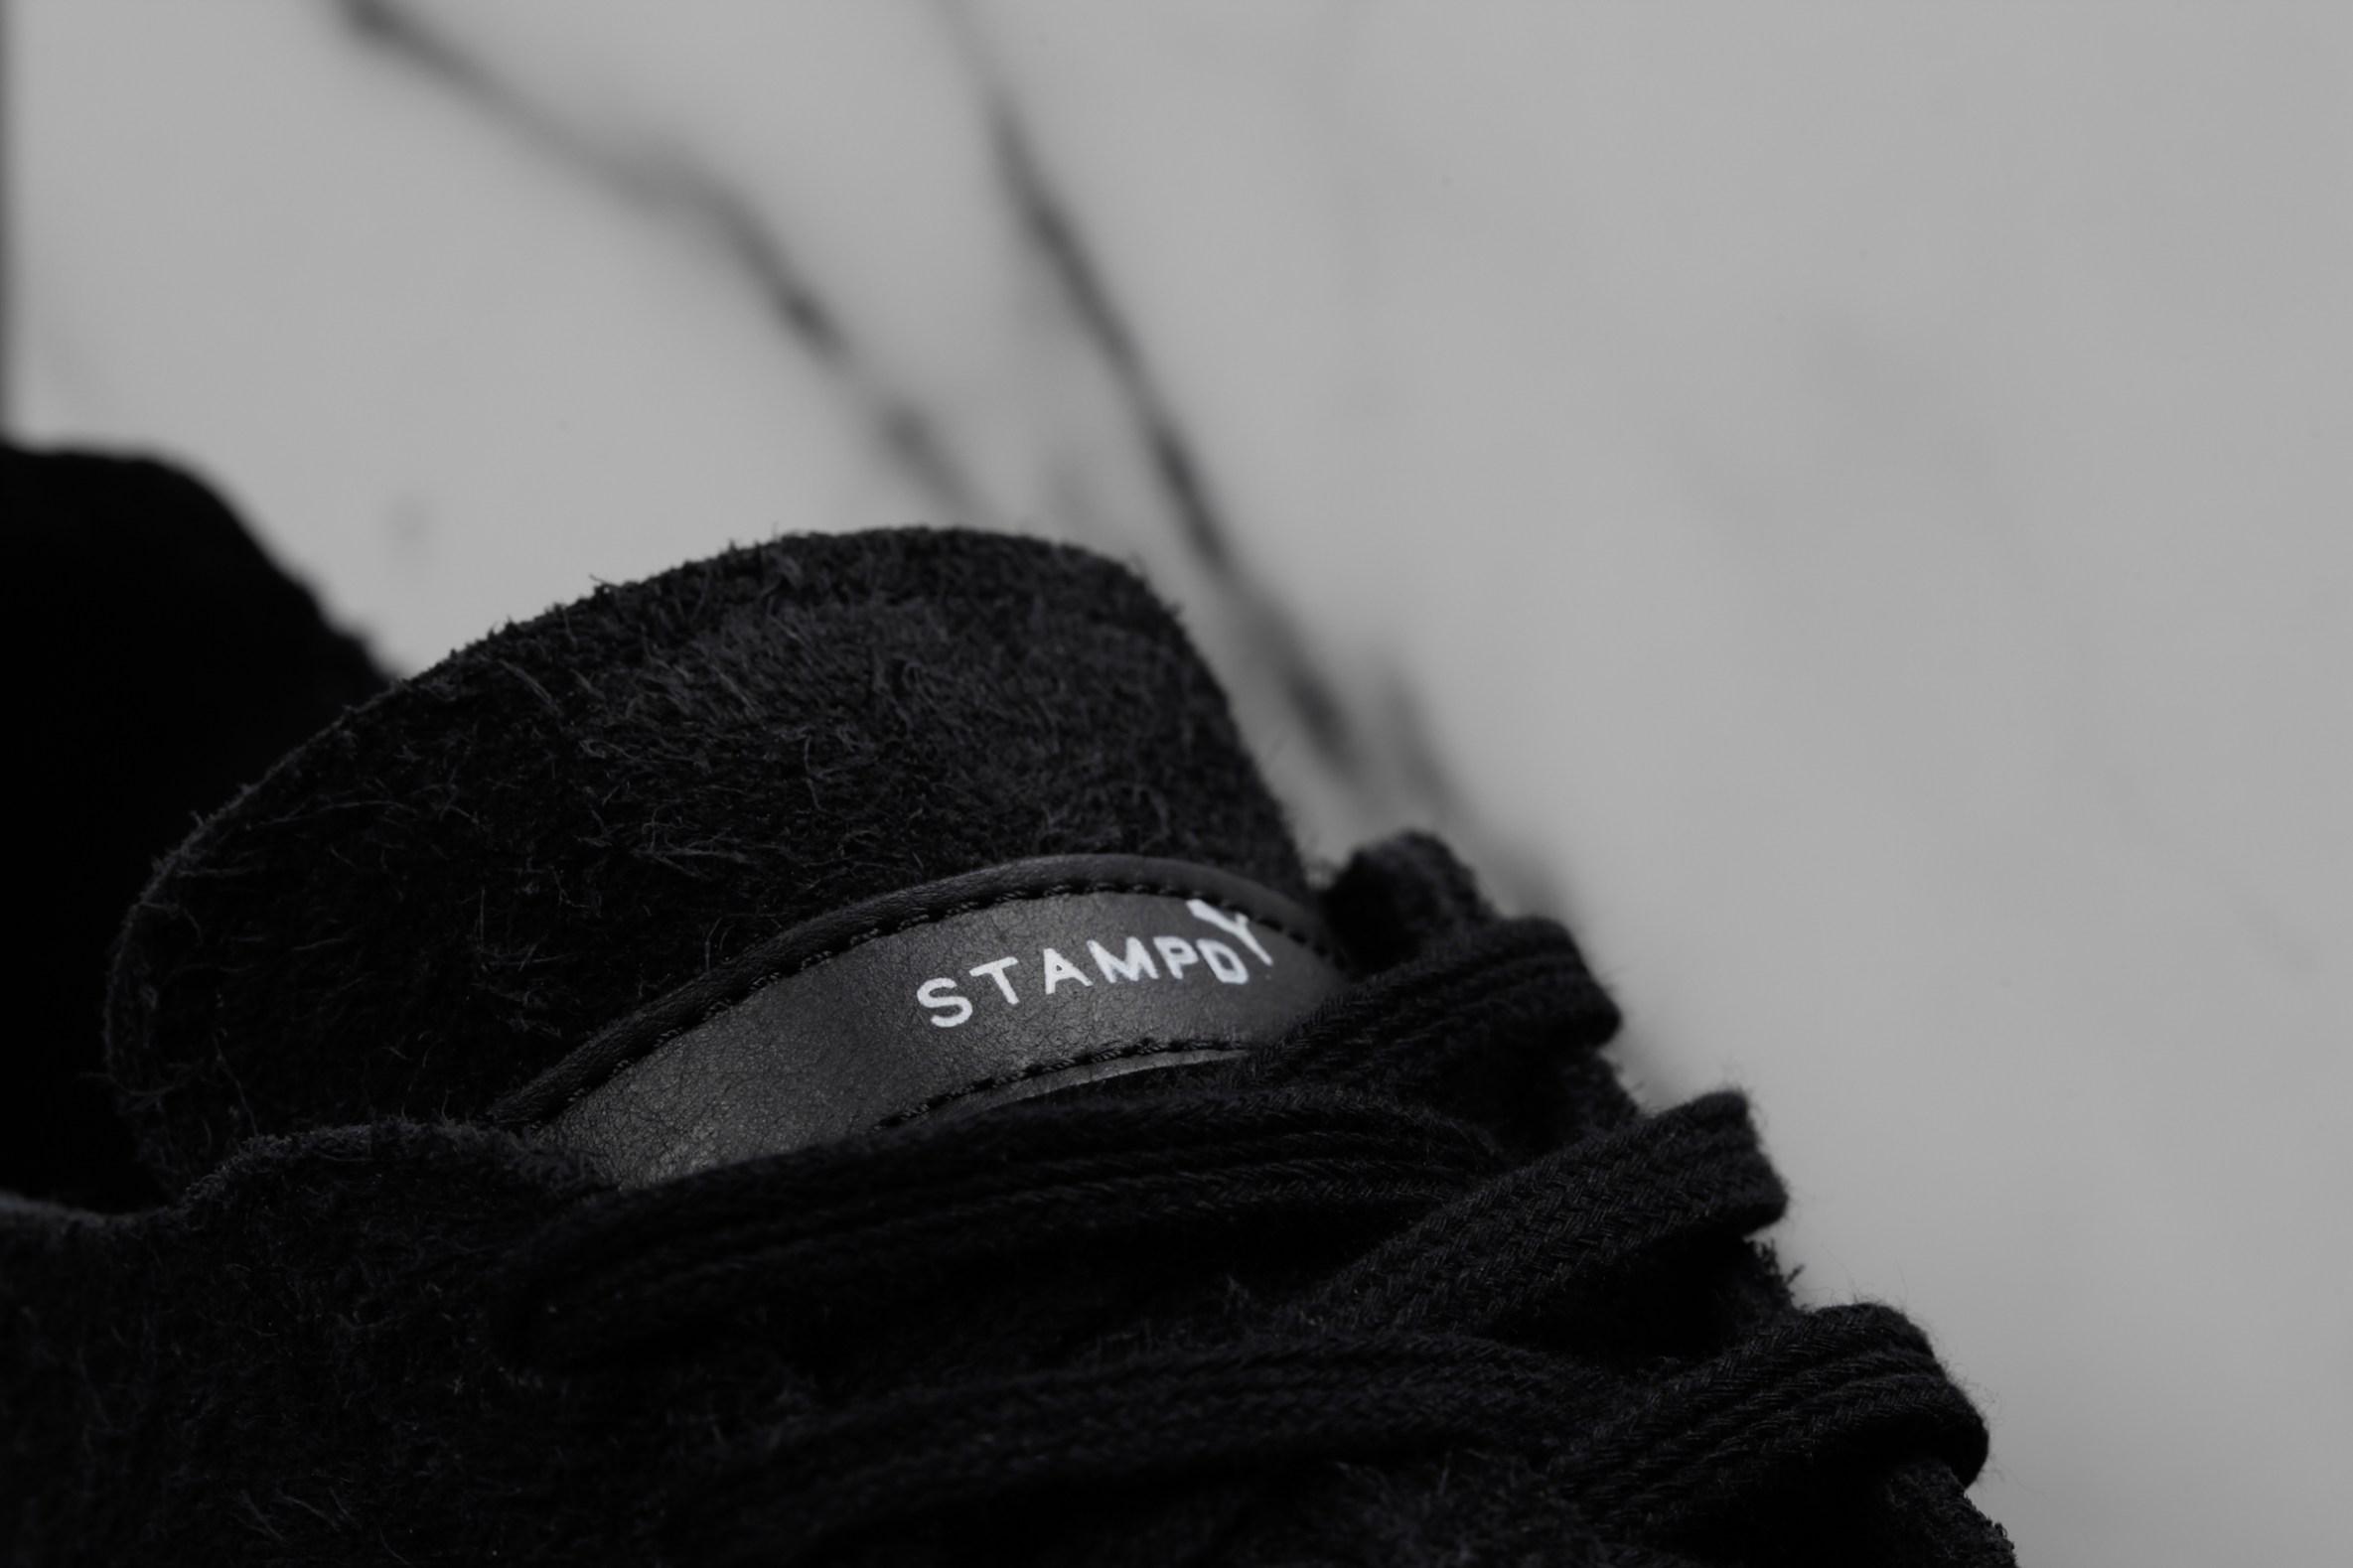 stampd-puma-states-9